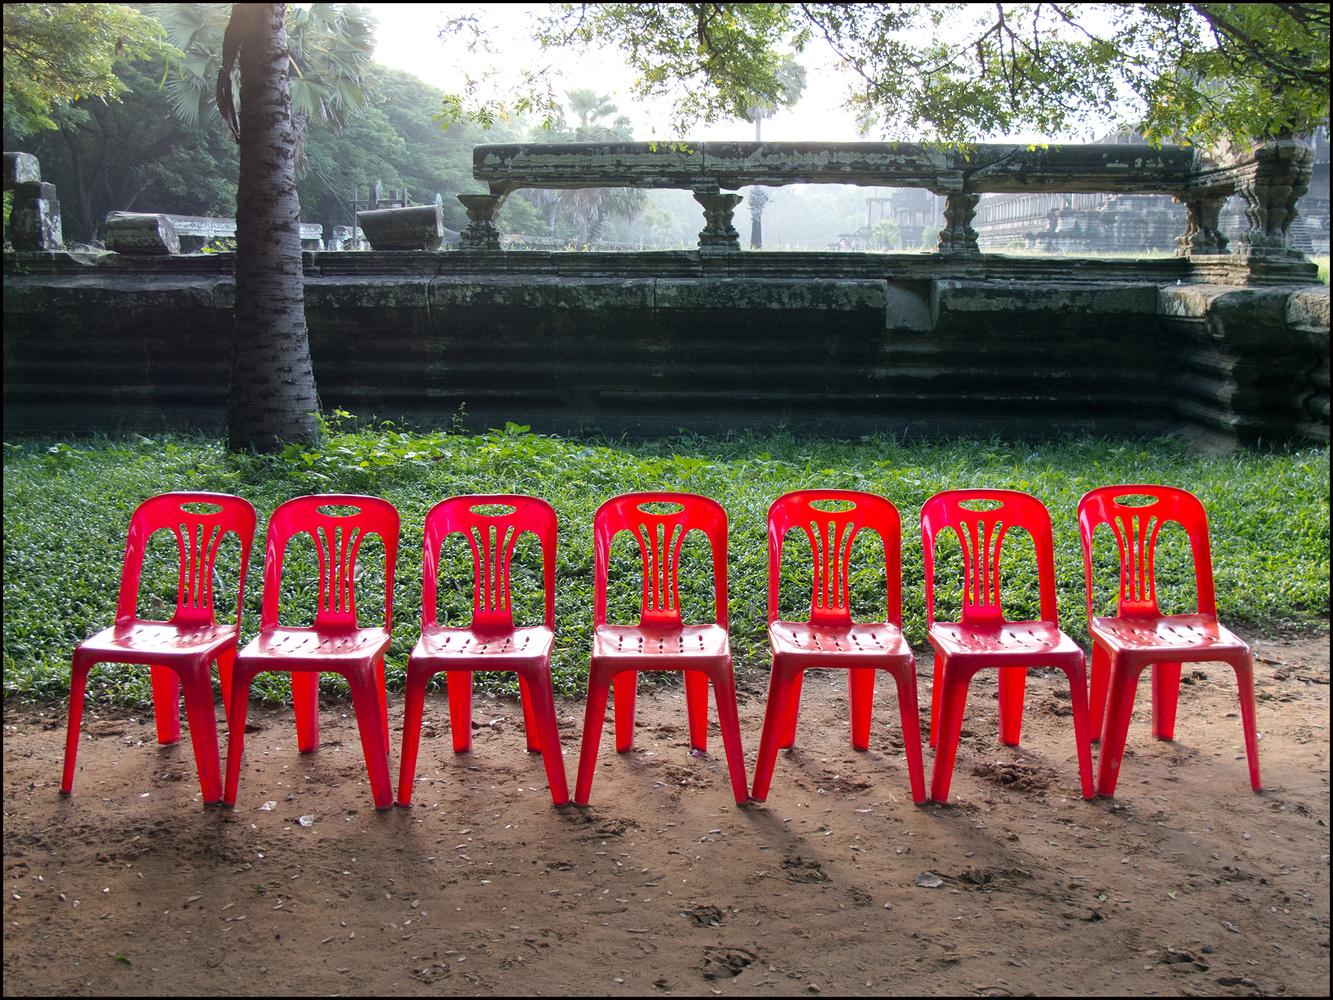 Red Chairs at Angkor Wat Temple by John Langford